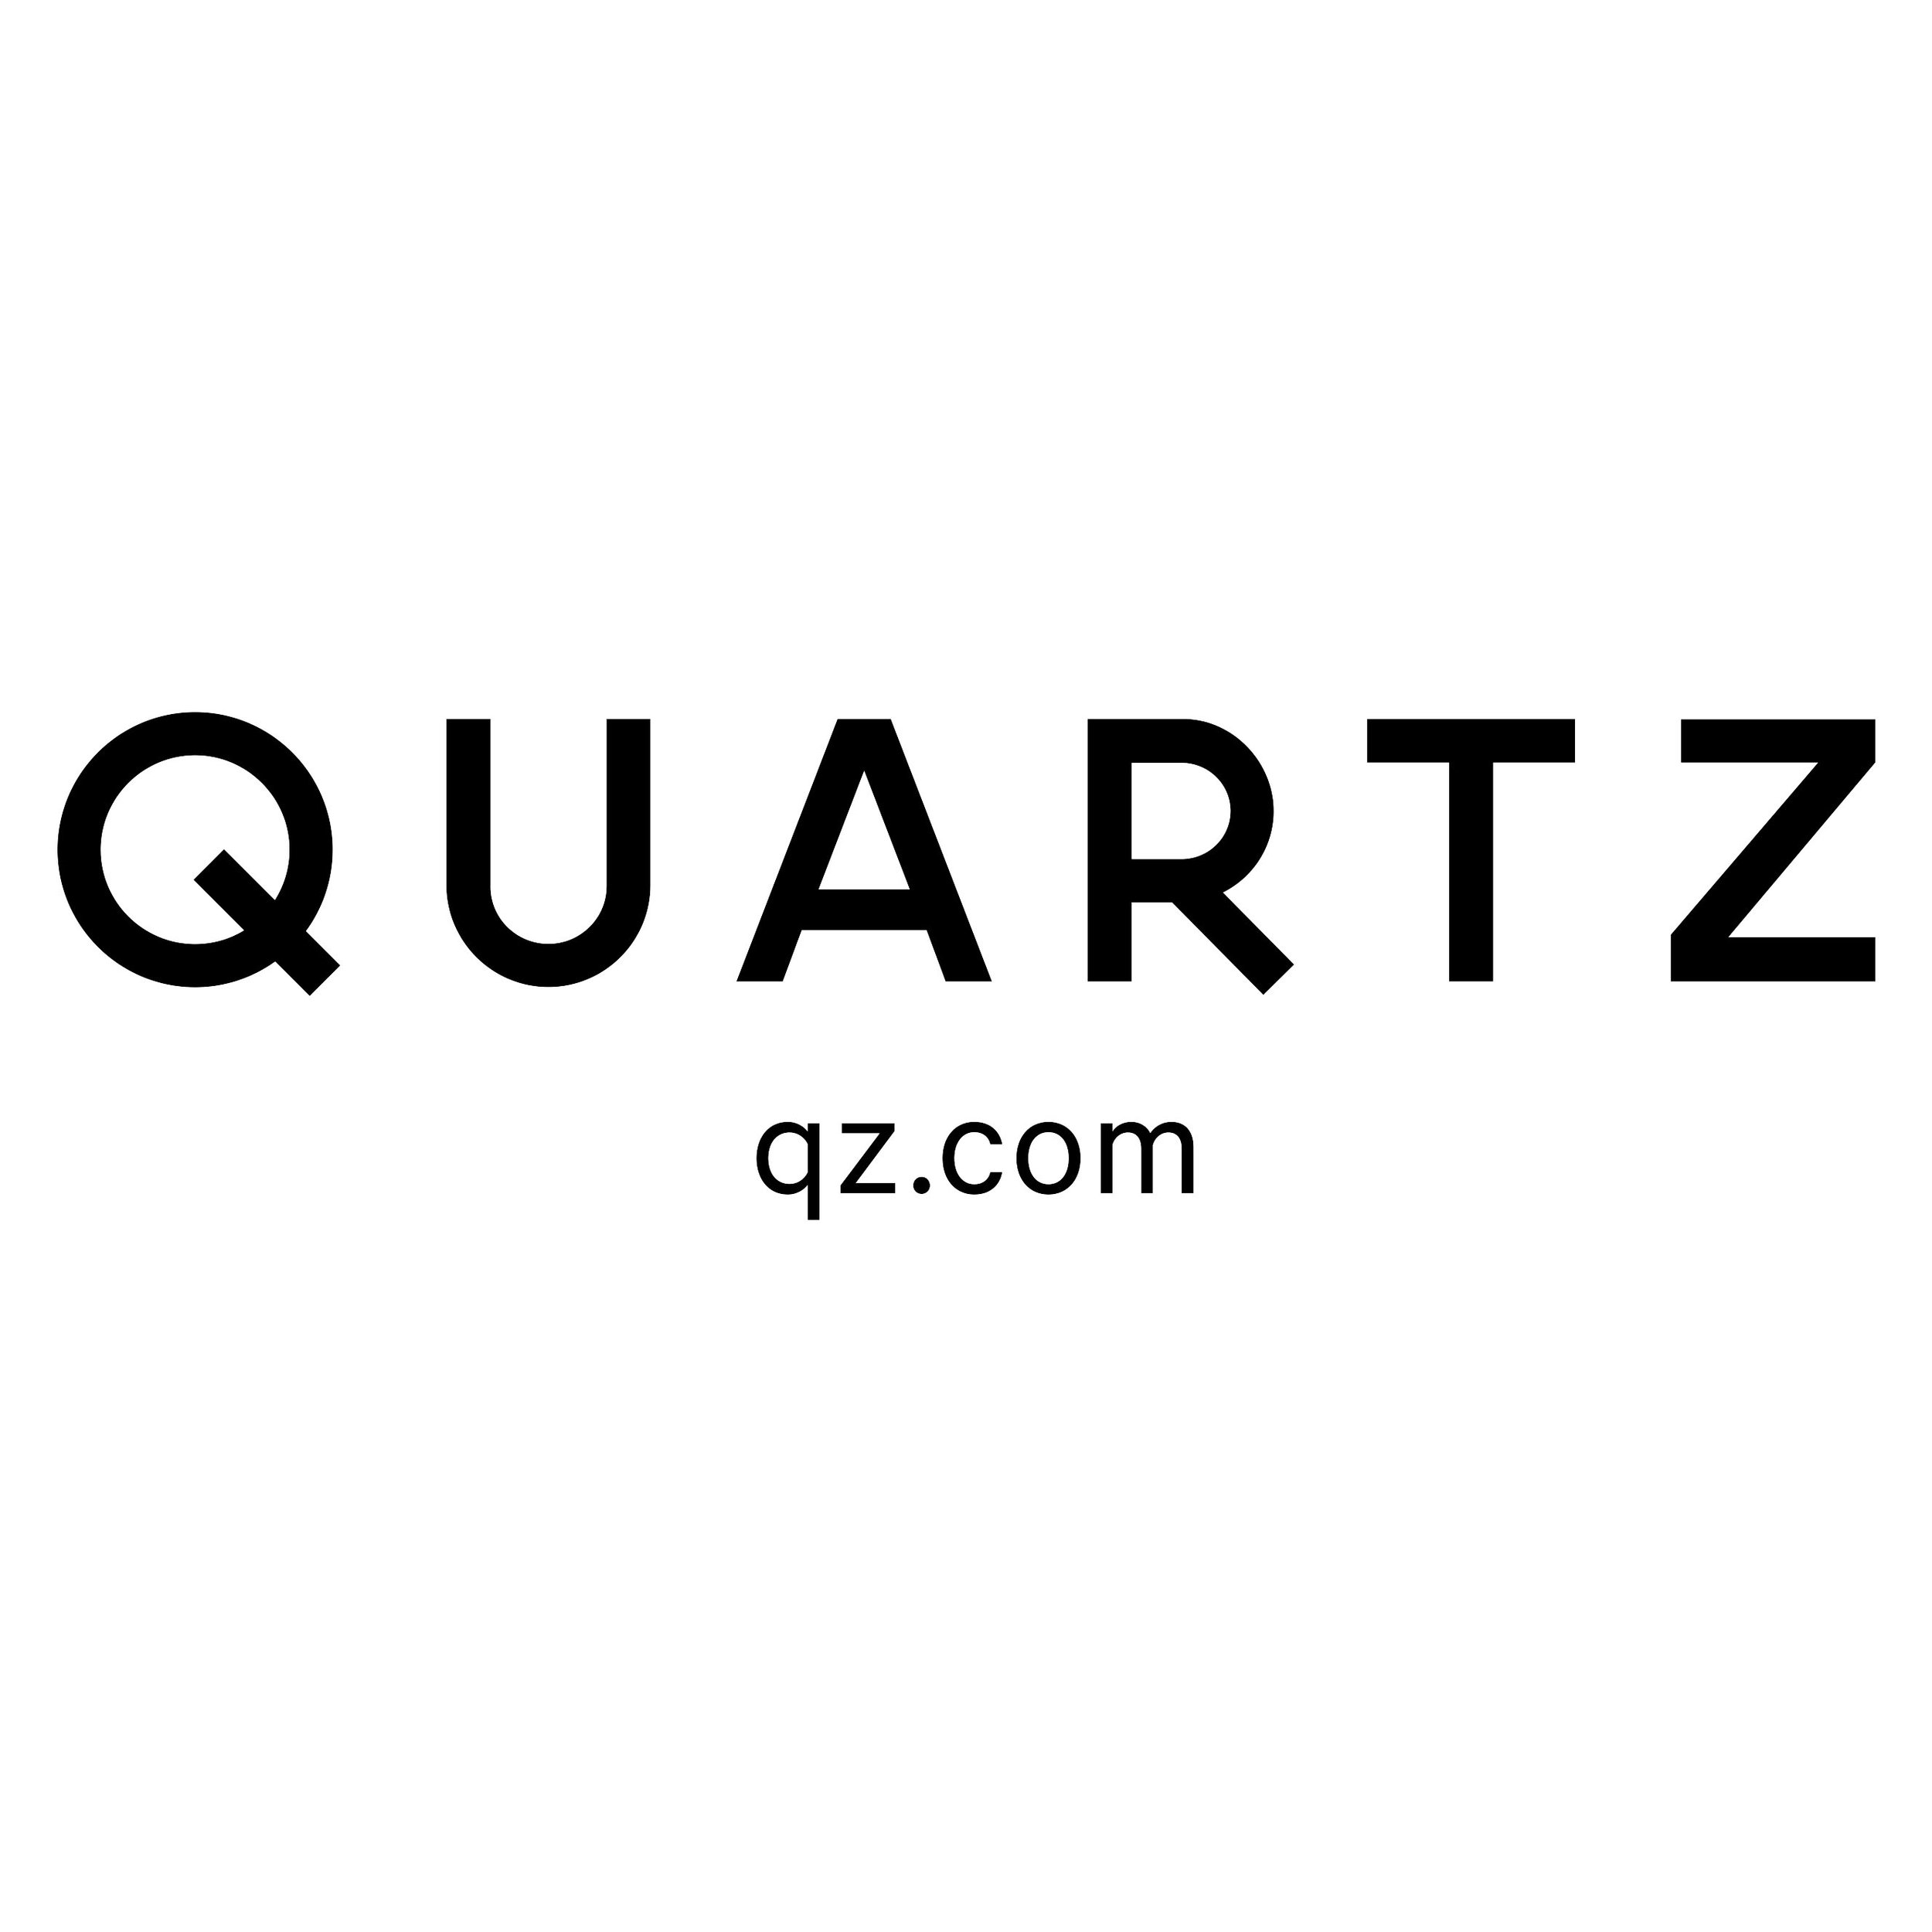 quartz logo.jpg